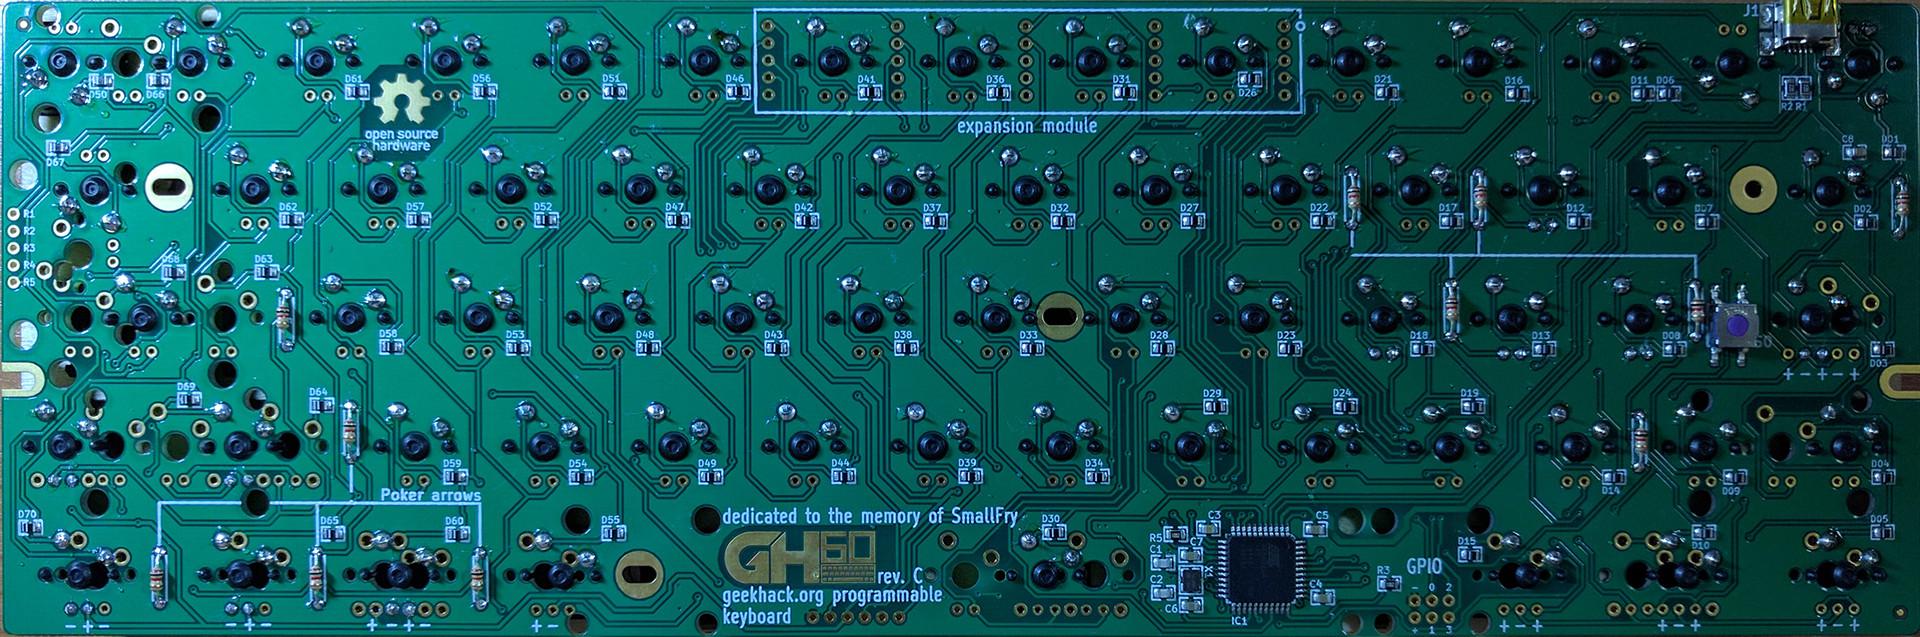 gh60 Rev C PCB